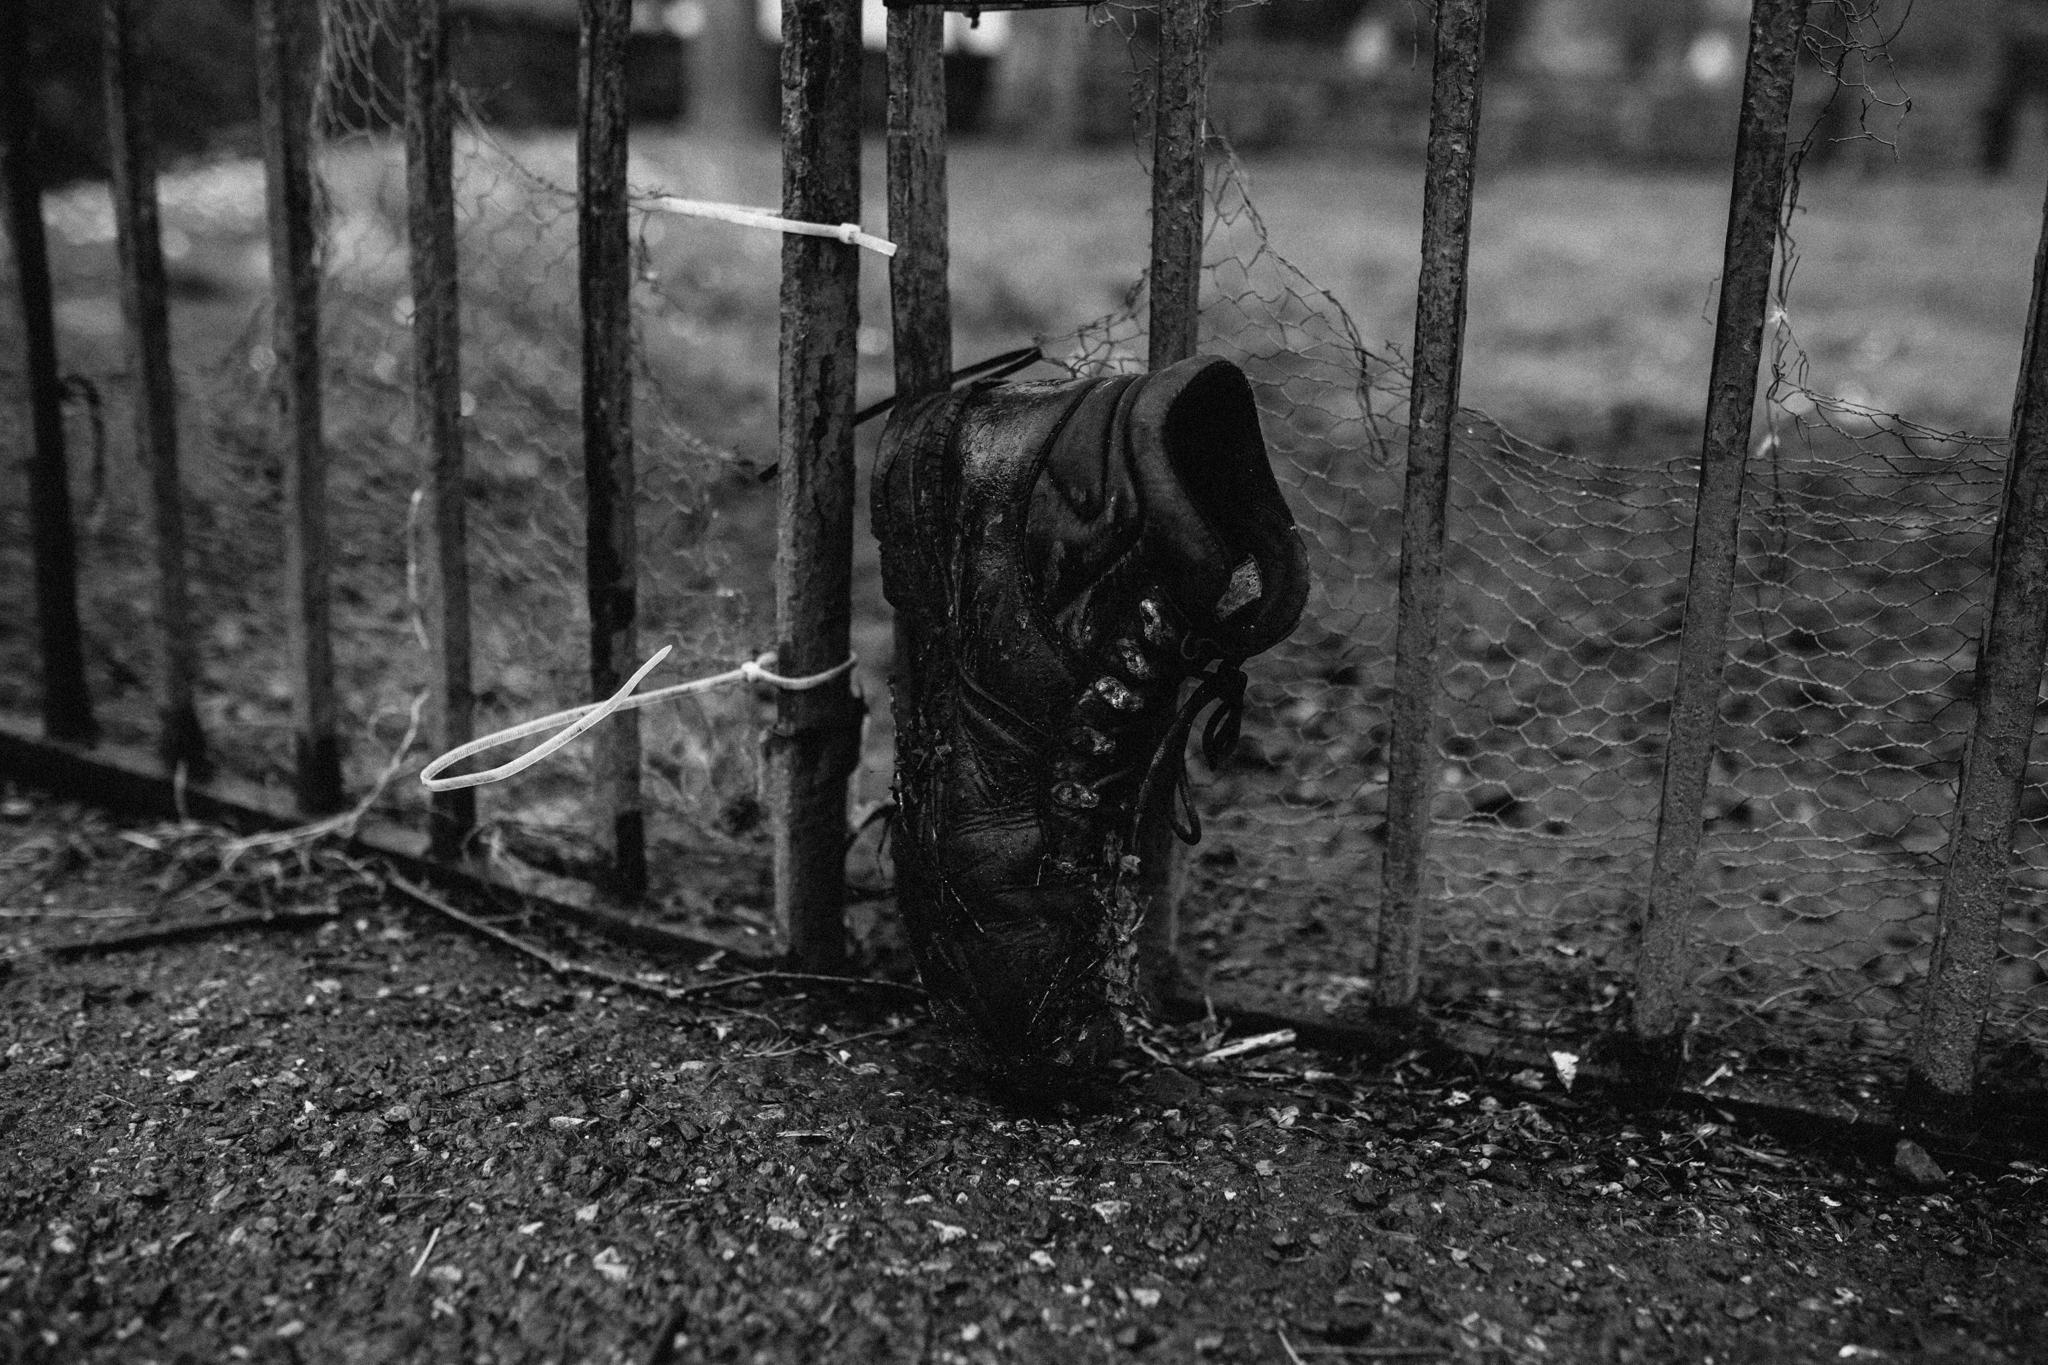 ireland_galway_dublin_rebecca_burt_photography-69.jpg